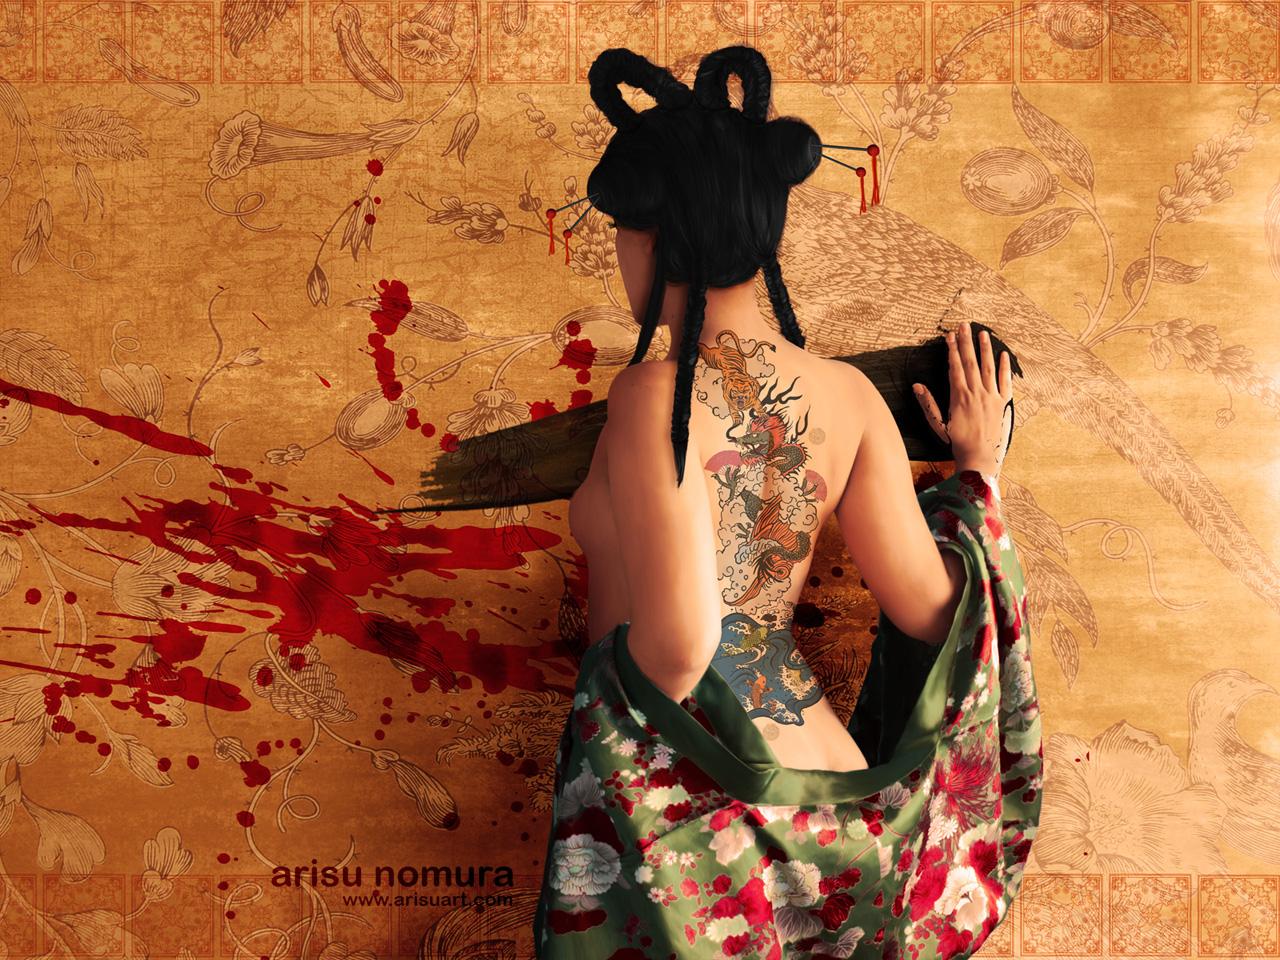 http://3.bp.blogspot.com/_v6BH26hvz2o/TTXjAa0i4bI/AAAAAAAACXY/Ugz8M_JNuK0/s1600/Tiger+Girl+Tattoo-461776.jpeg